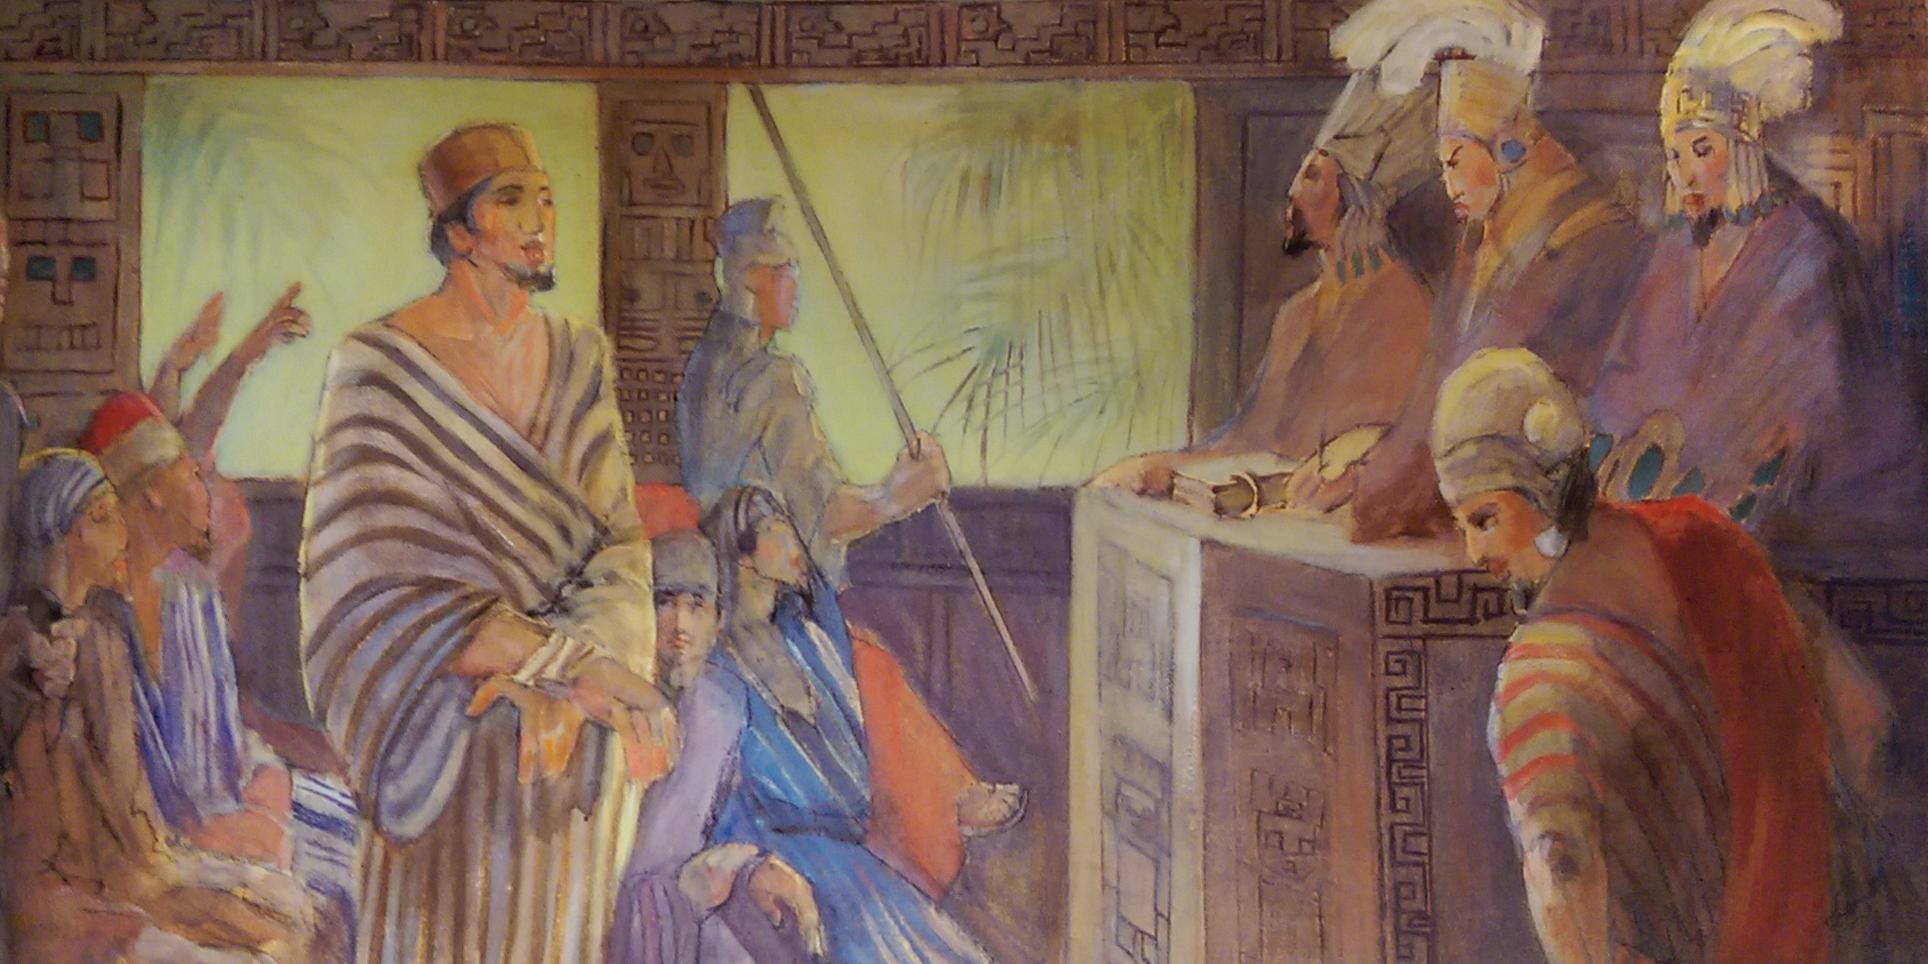 Minerva Teichert Paintings LDS art BYU48.jpg